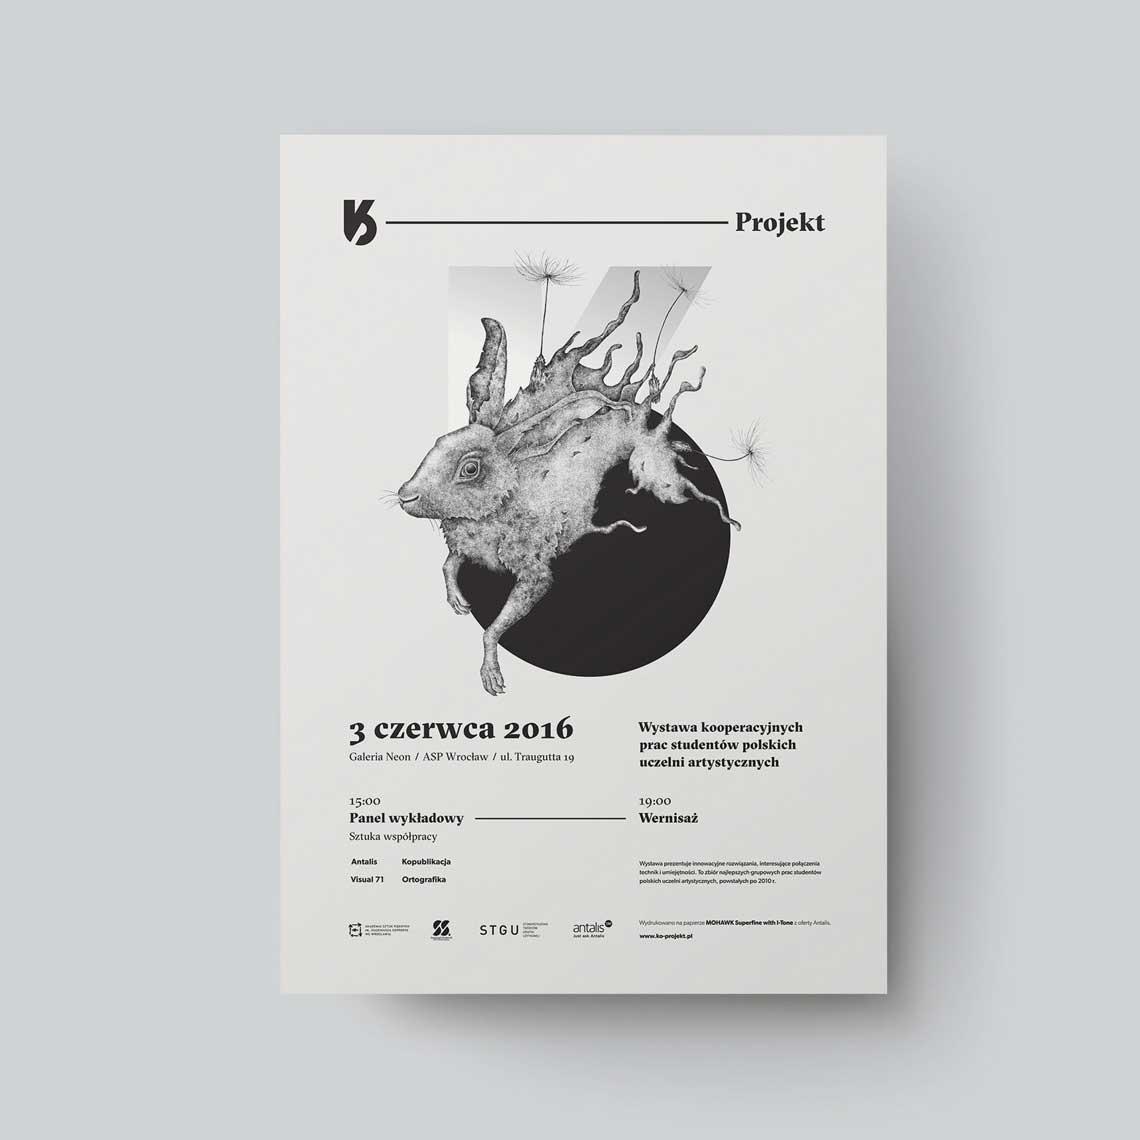 KO – Projekt